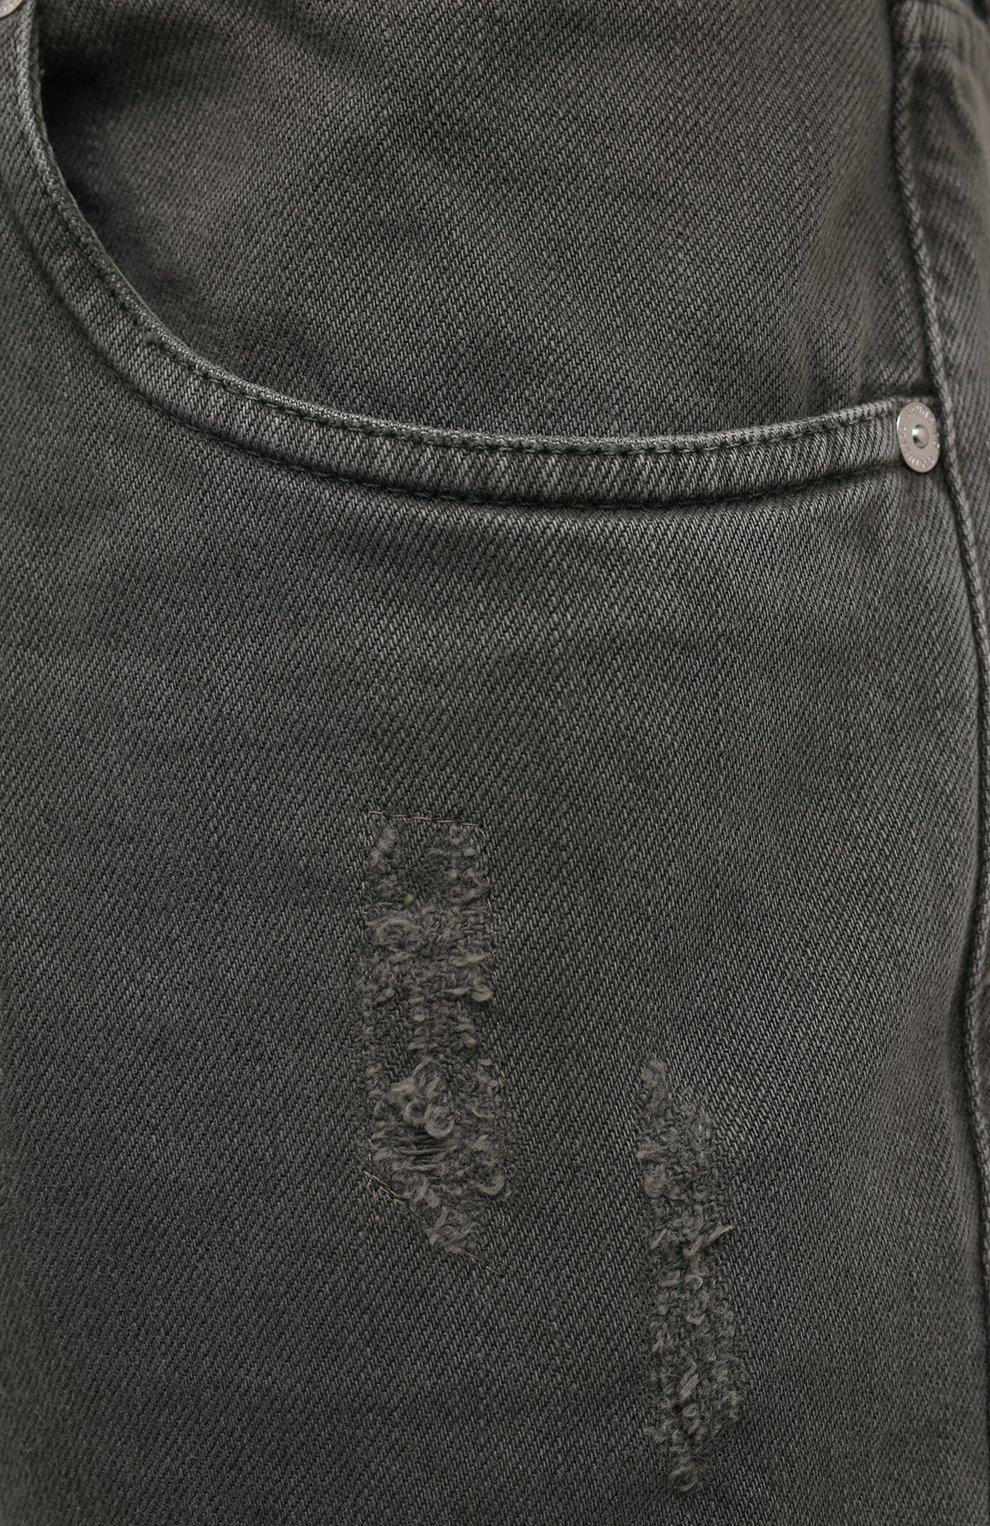 Мужские джинсы BRUNELLO CUCINELLI хаки цвета, арт. M262PX2340   Фото 5